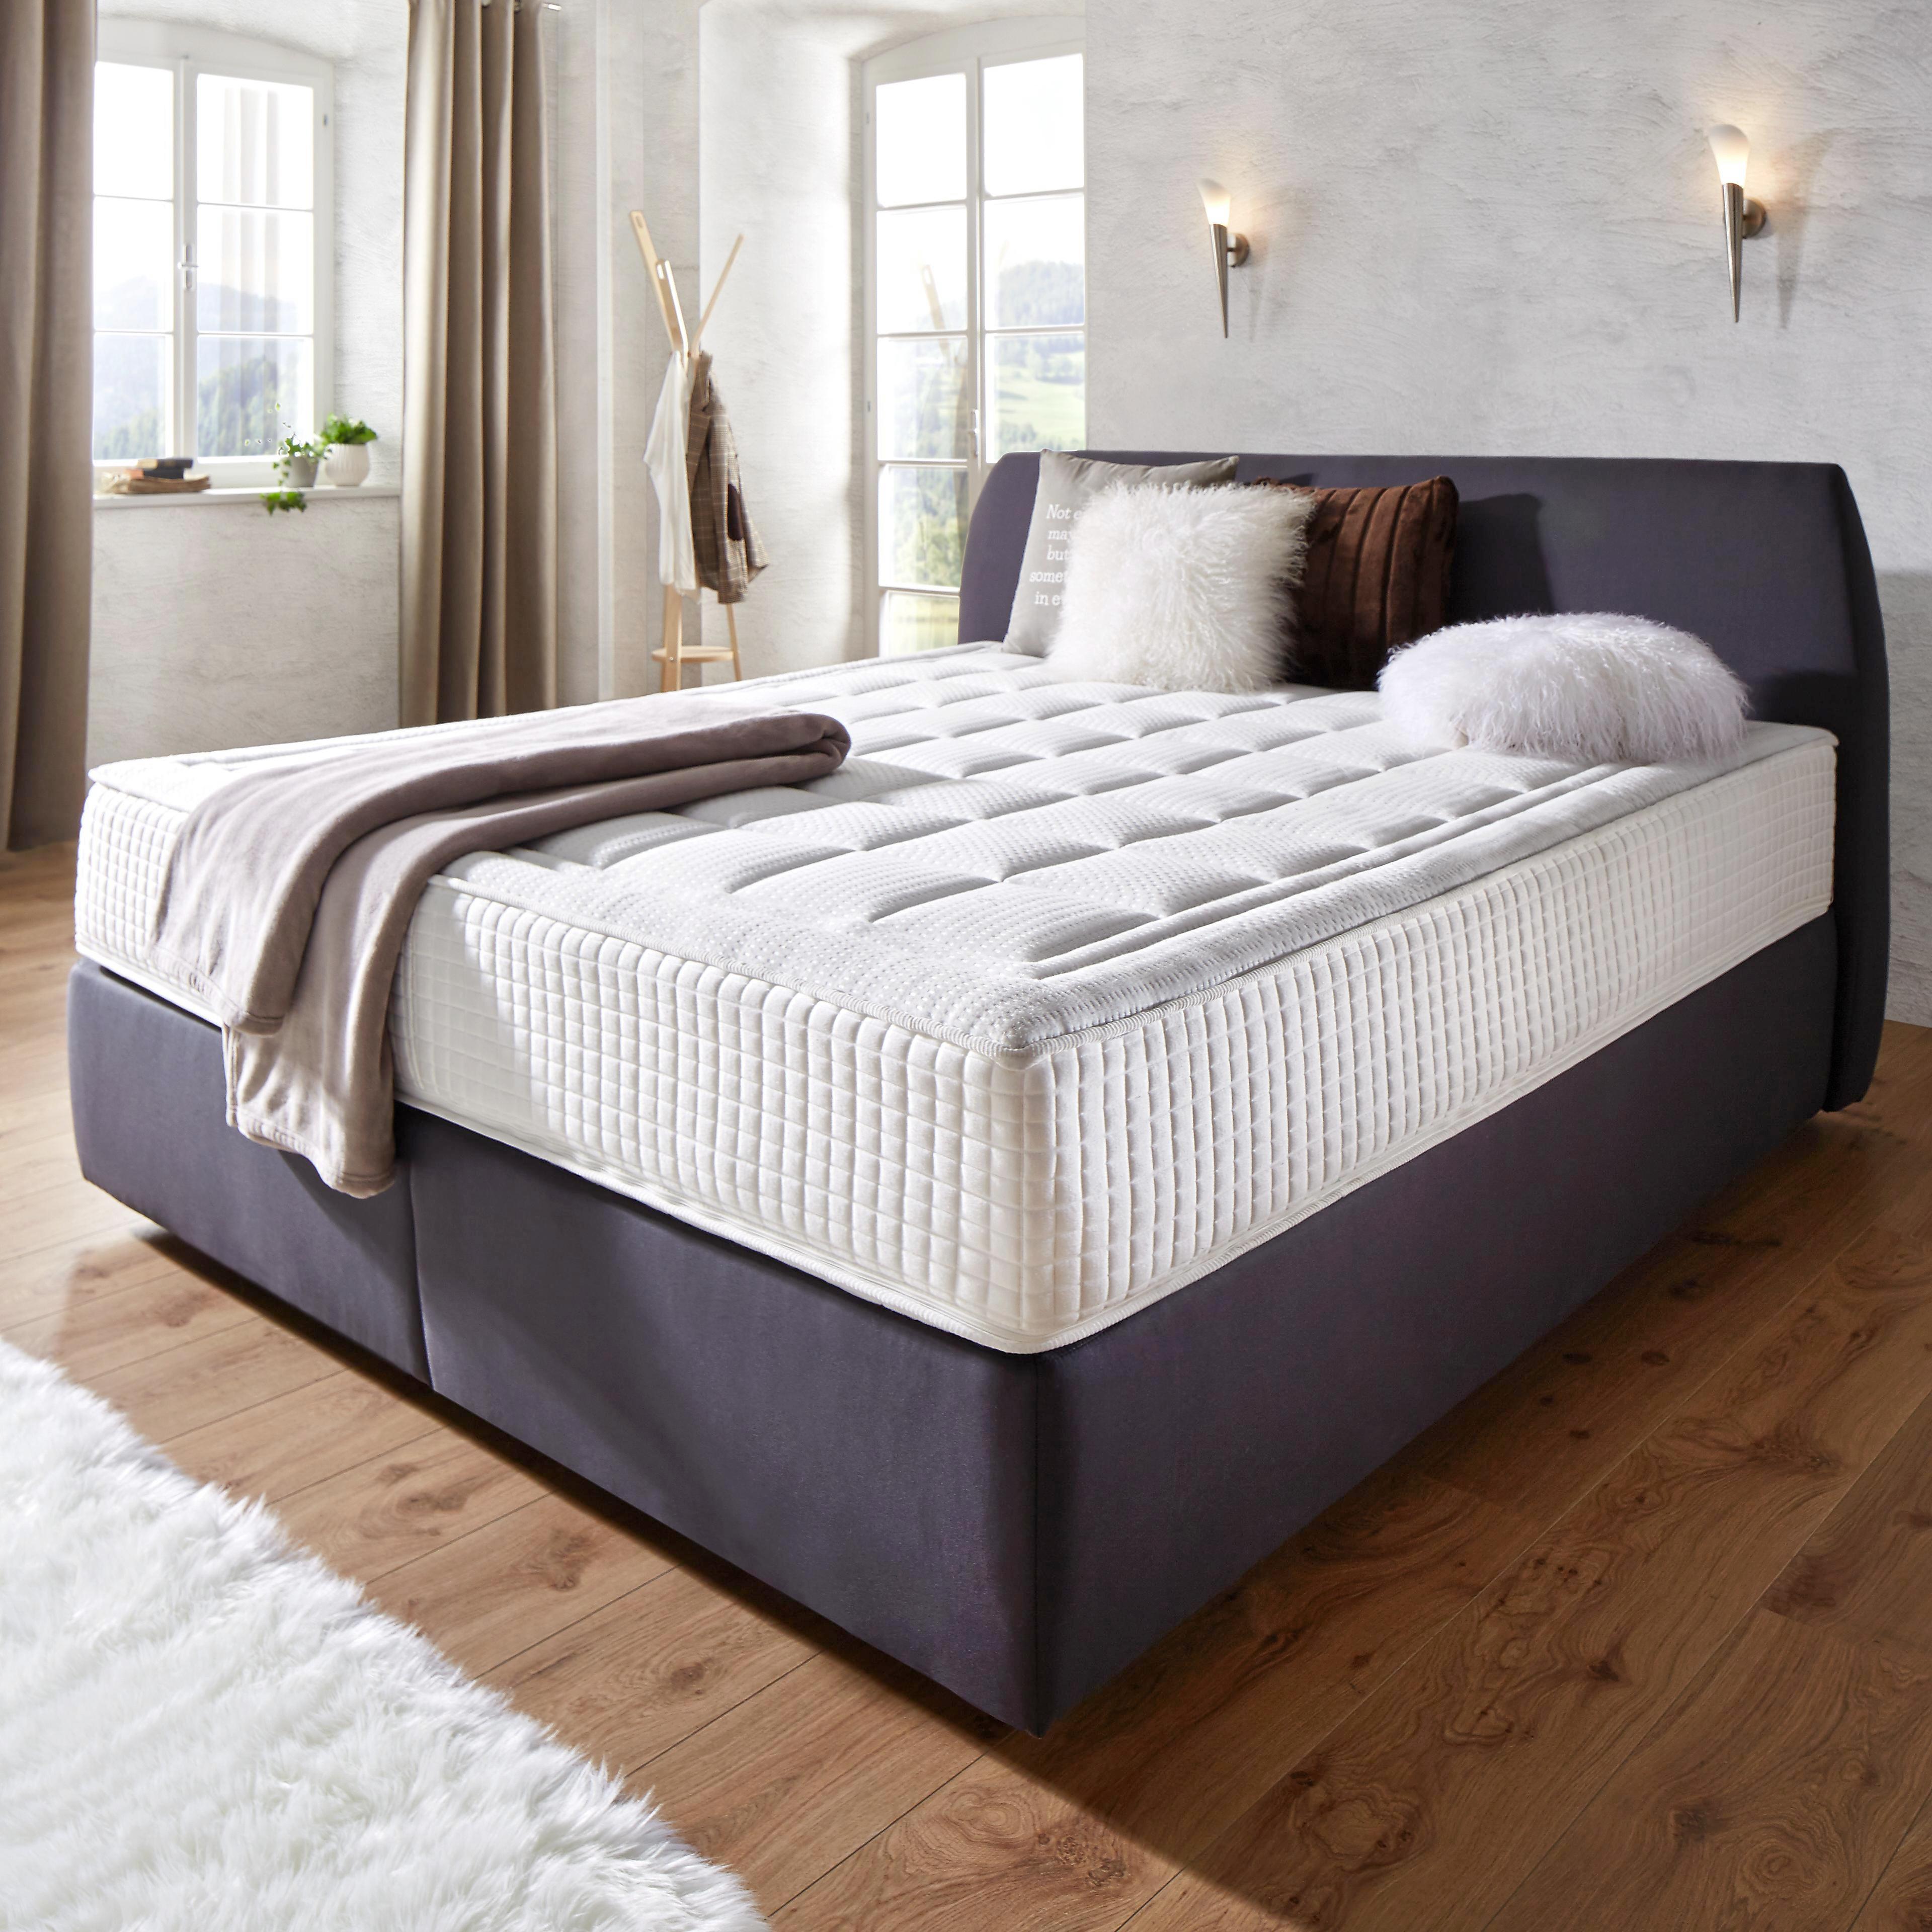 Kontinentalbett in Anthrazit ca. 180x200cm - Anthrazit, Holzwerkstoff/Textil (208/190/107cm) - PREMIUM LIVING